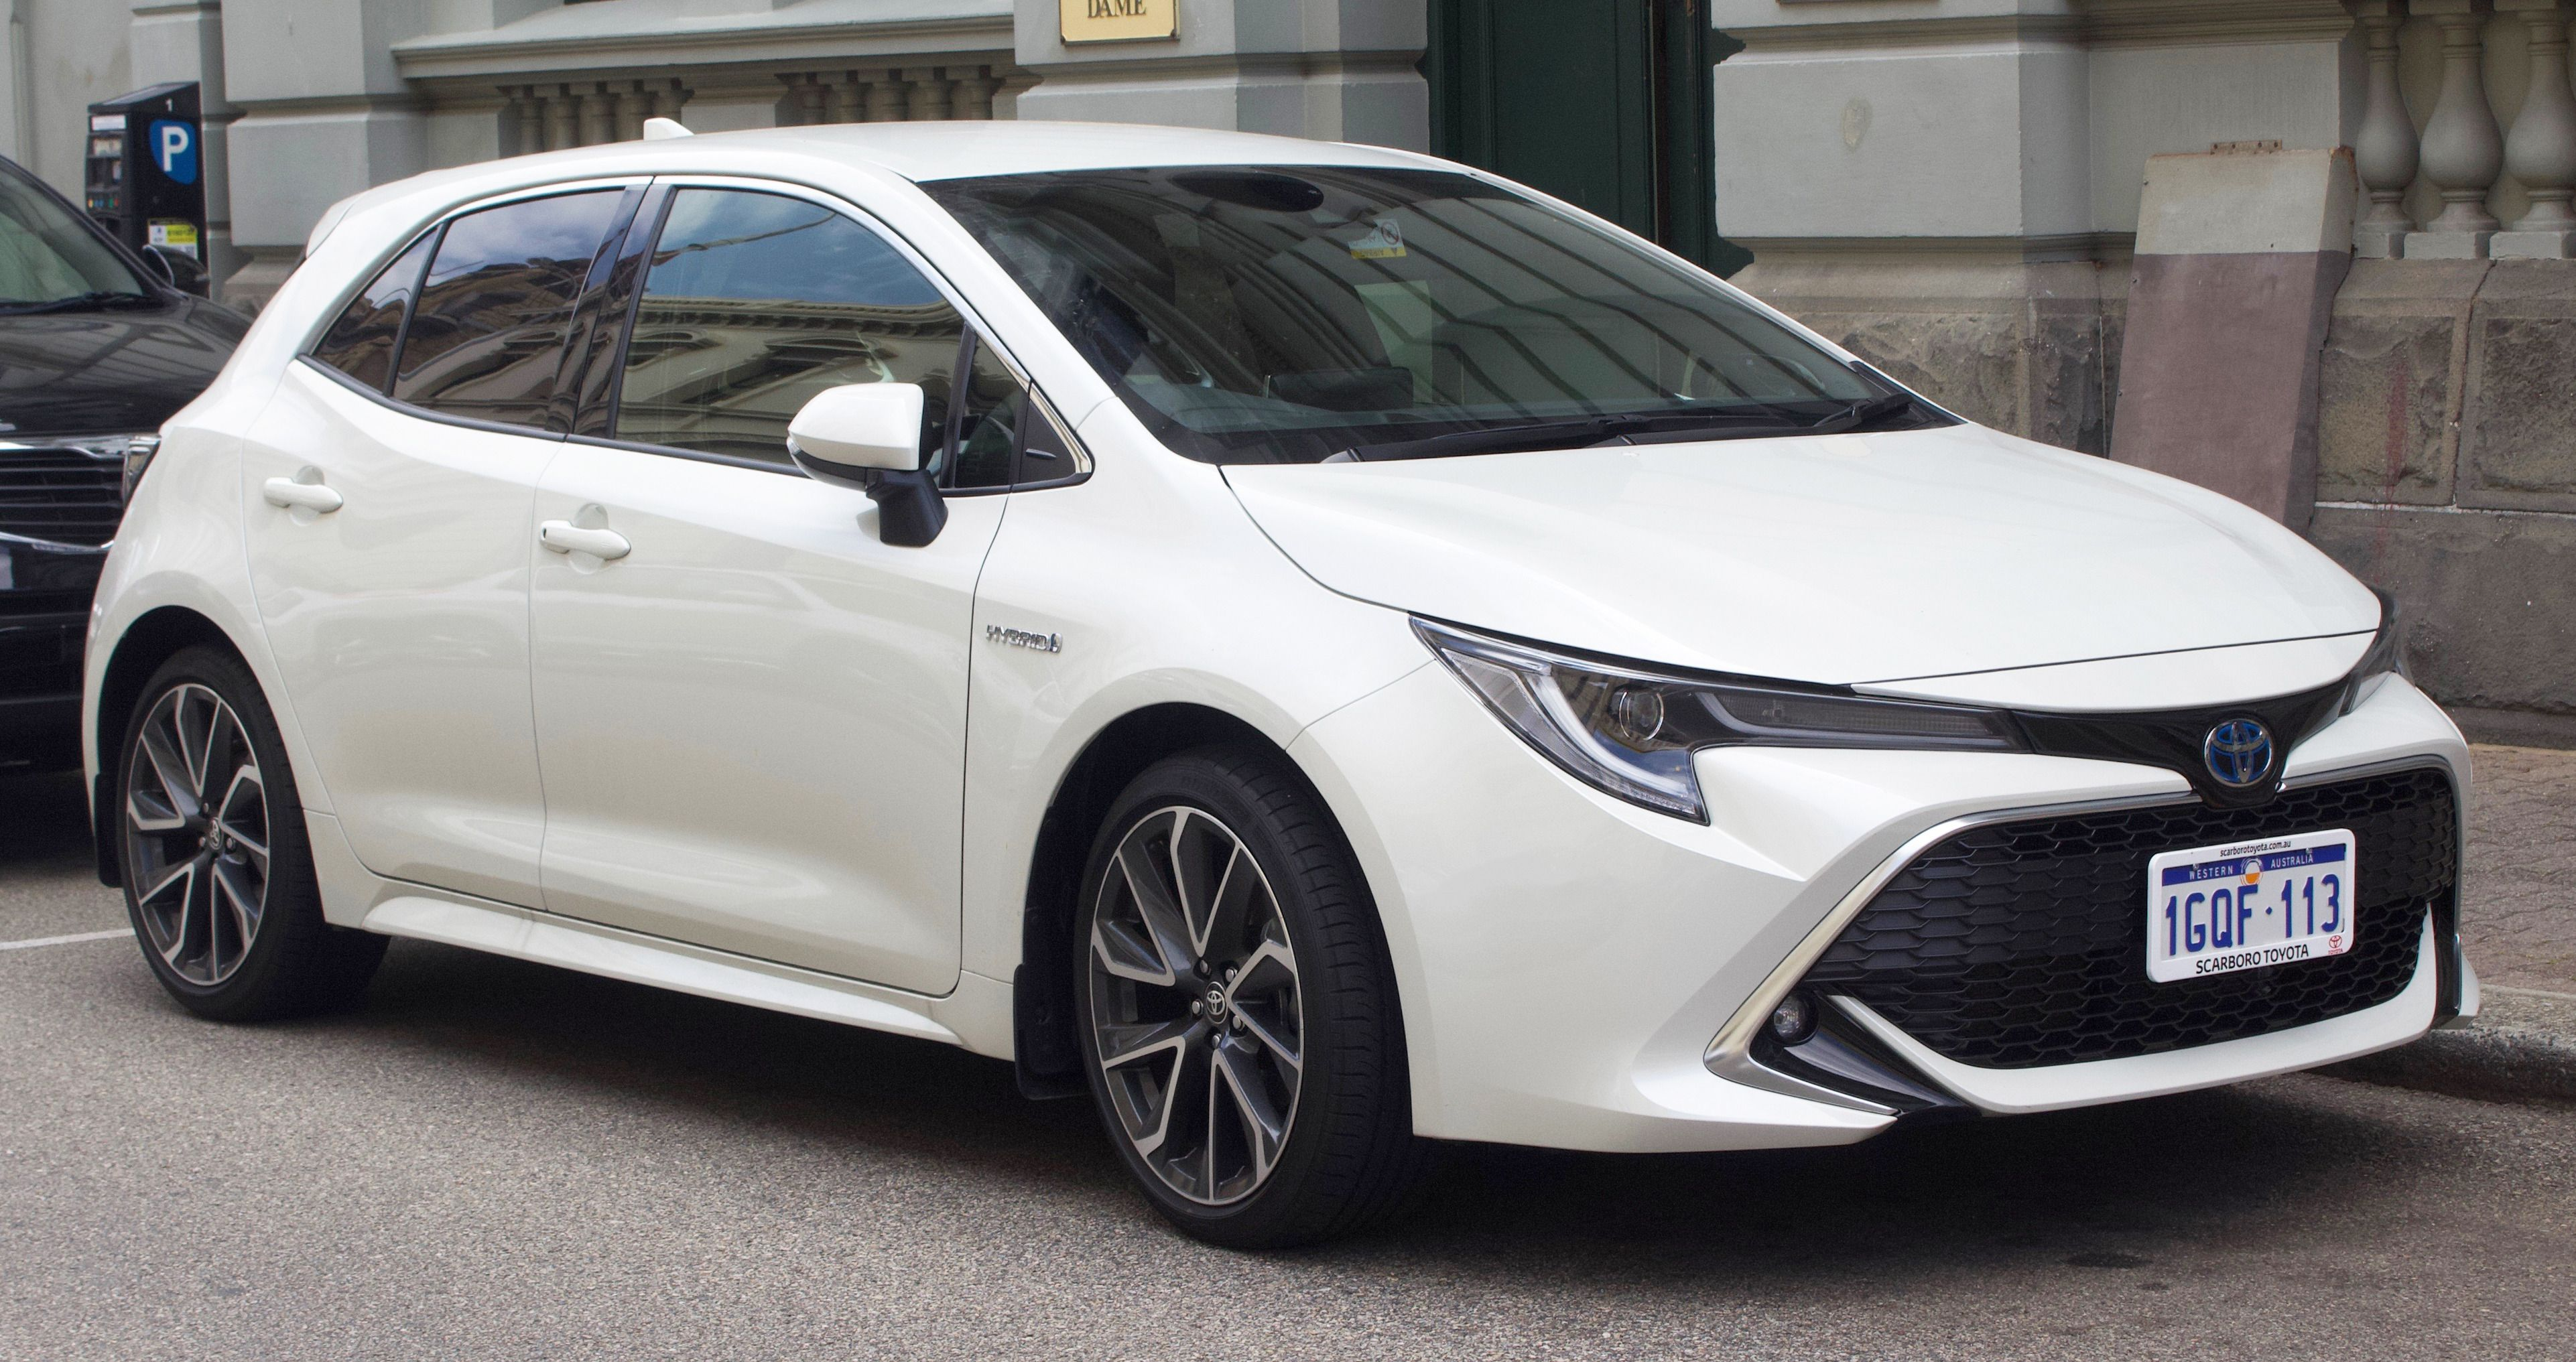 2019 Toyota Auris Best Cars Toyota Auris Toyota Audi Rs4